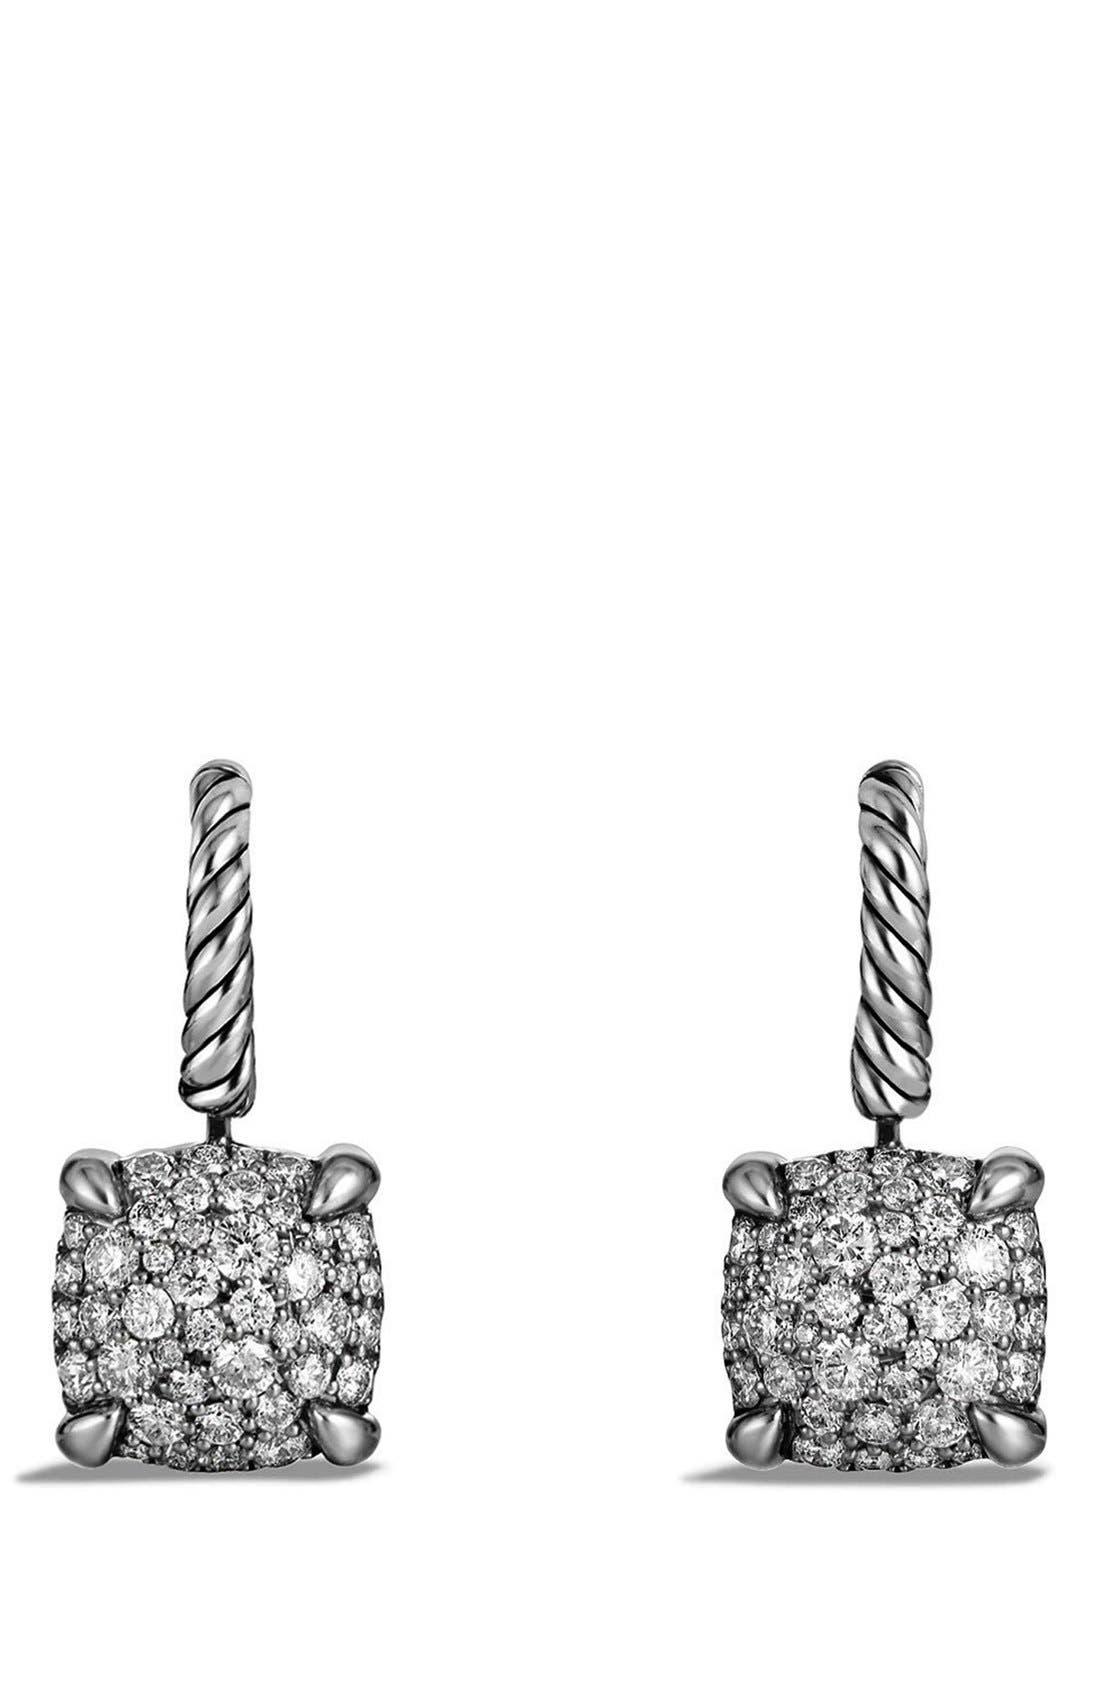 Alternate Image 1 Selected - David Yurman 'Châtelaine' Drop Earrings with Diamonds